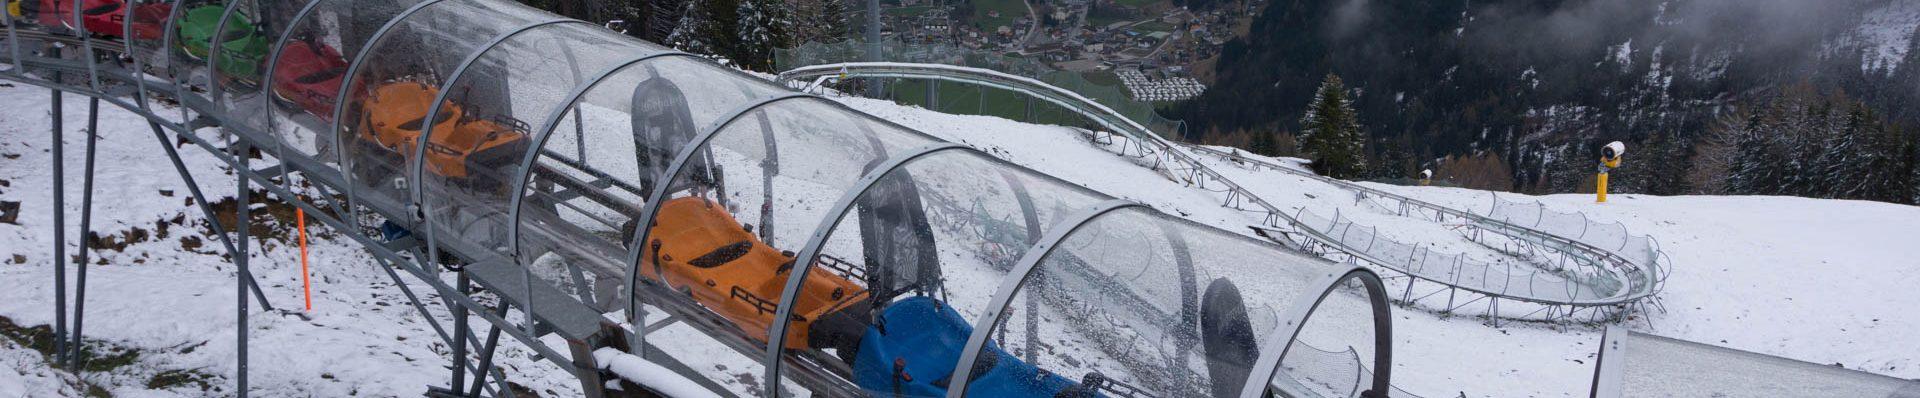 Kategorie: Graubünden